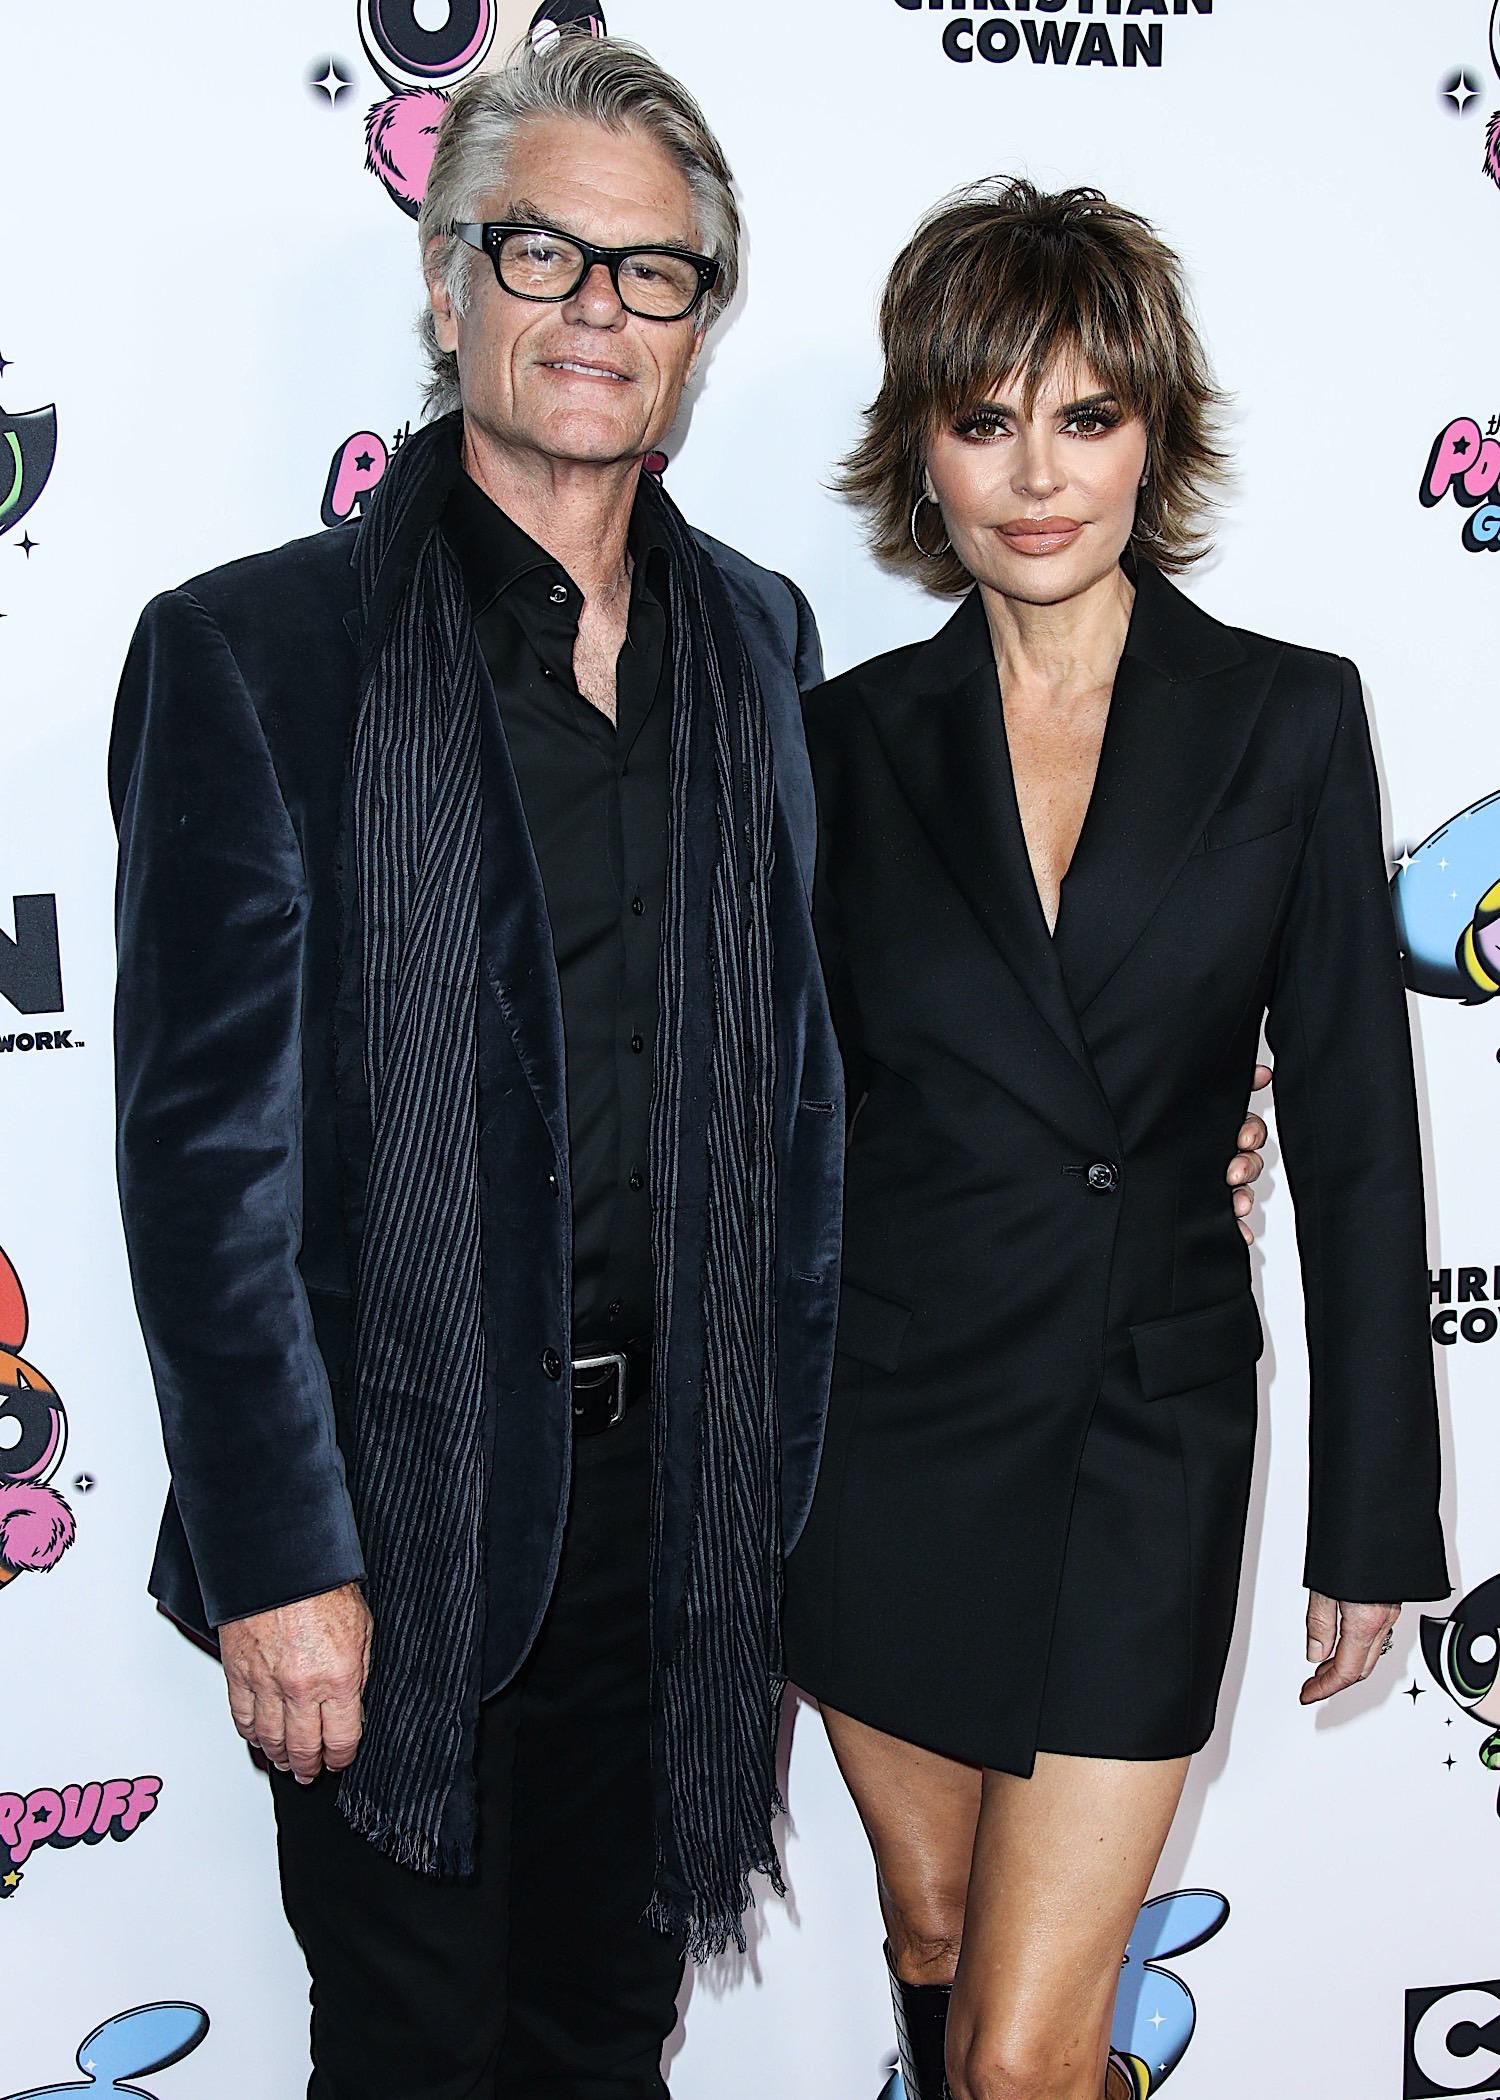 Lisa Rinna with Harry Hamlin at 2020 Christian Cowan